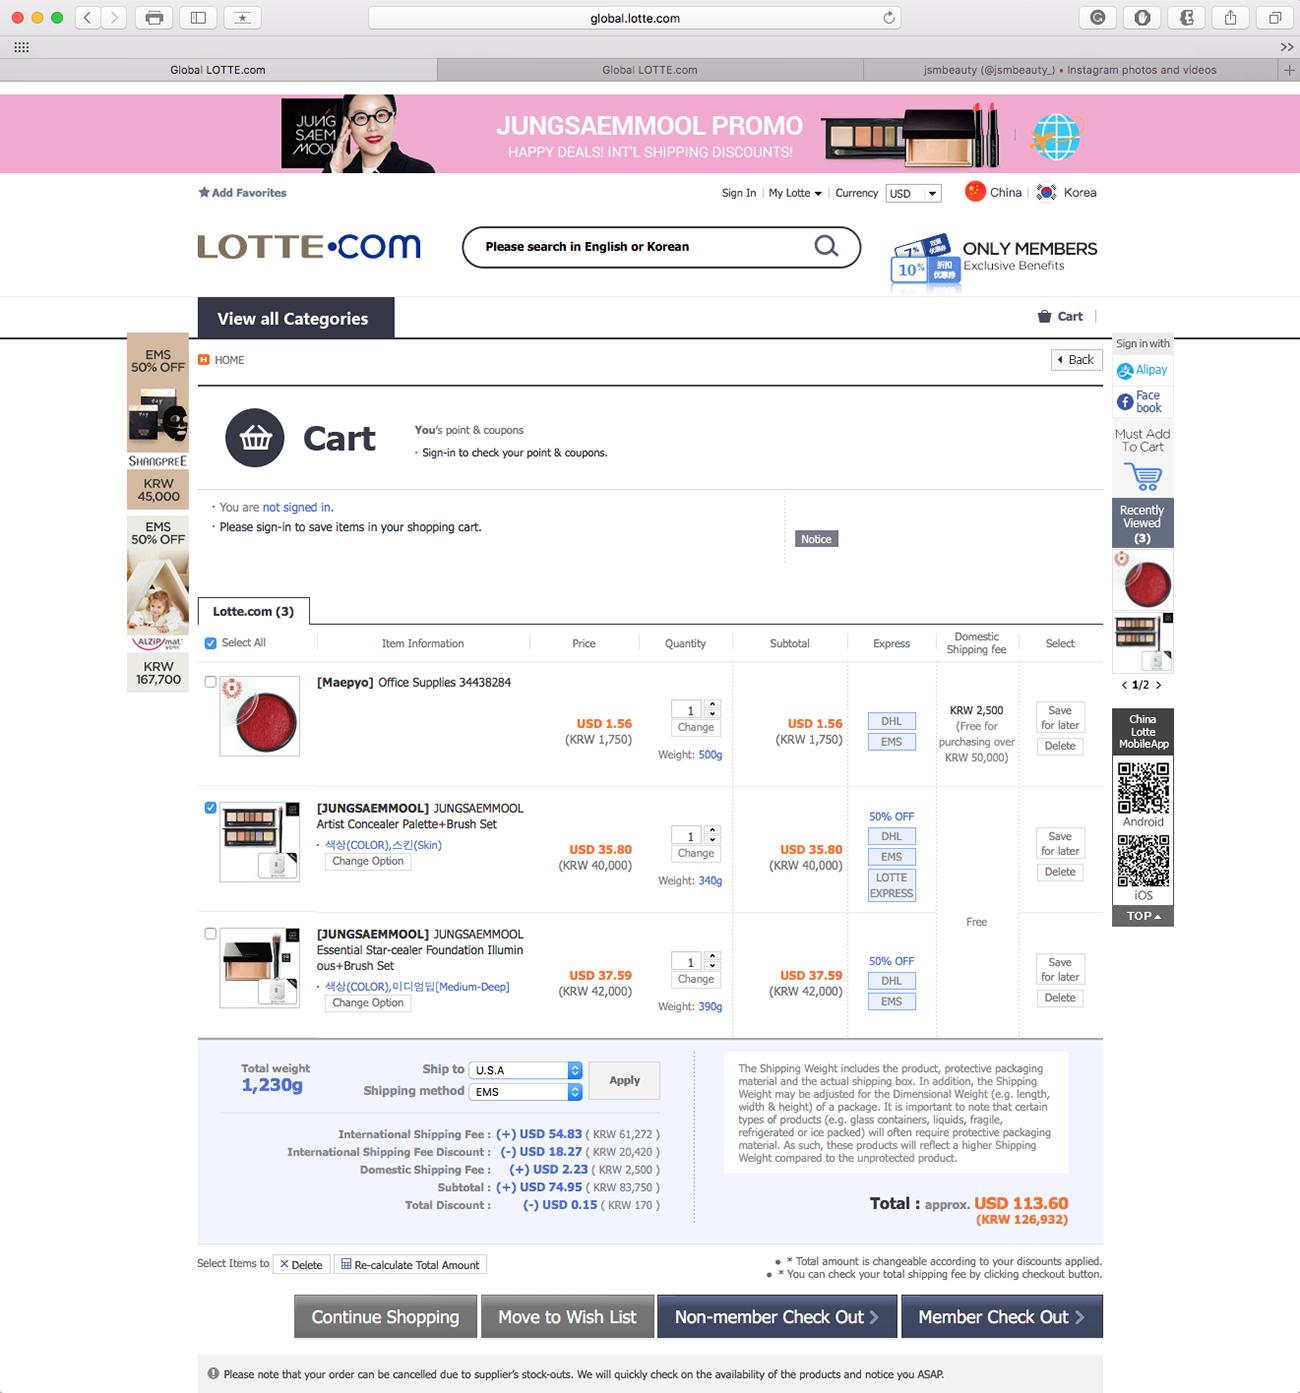 lavlilacs April 2017 haul - Global Lotte Shopping Cart page